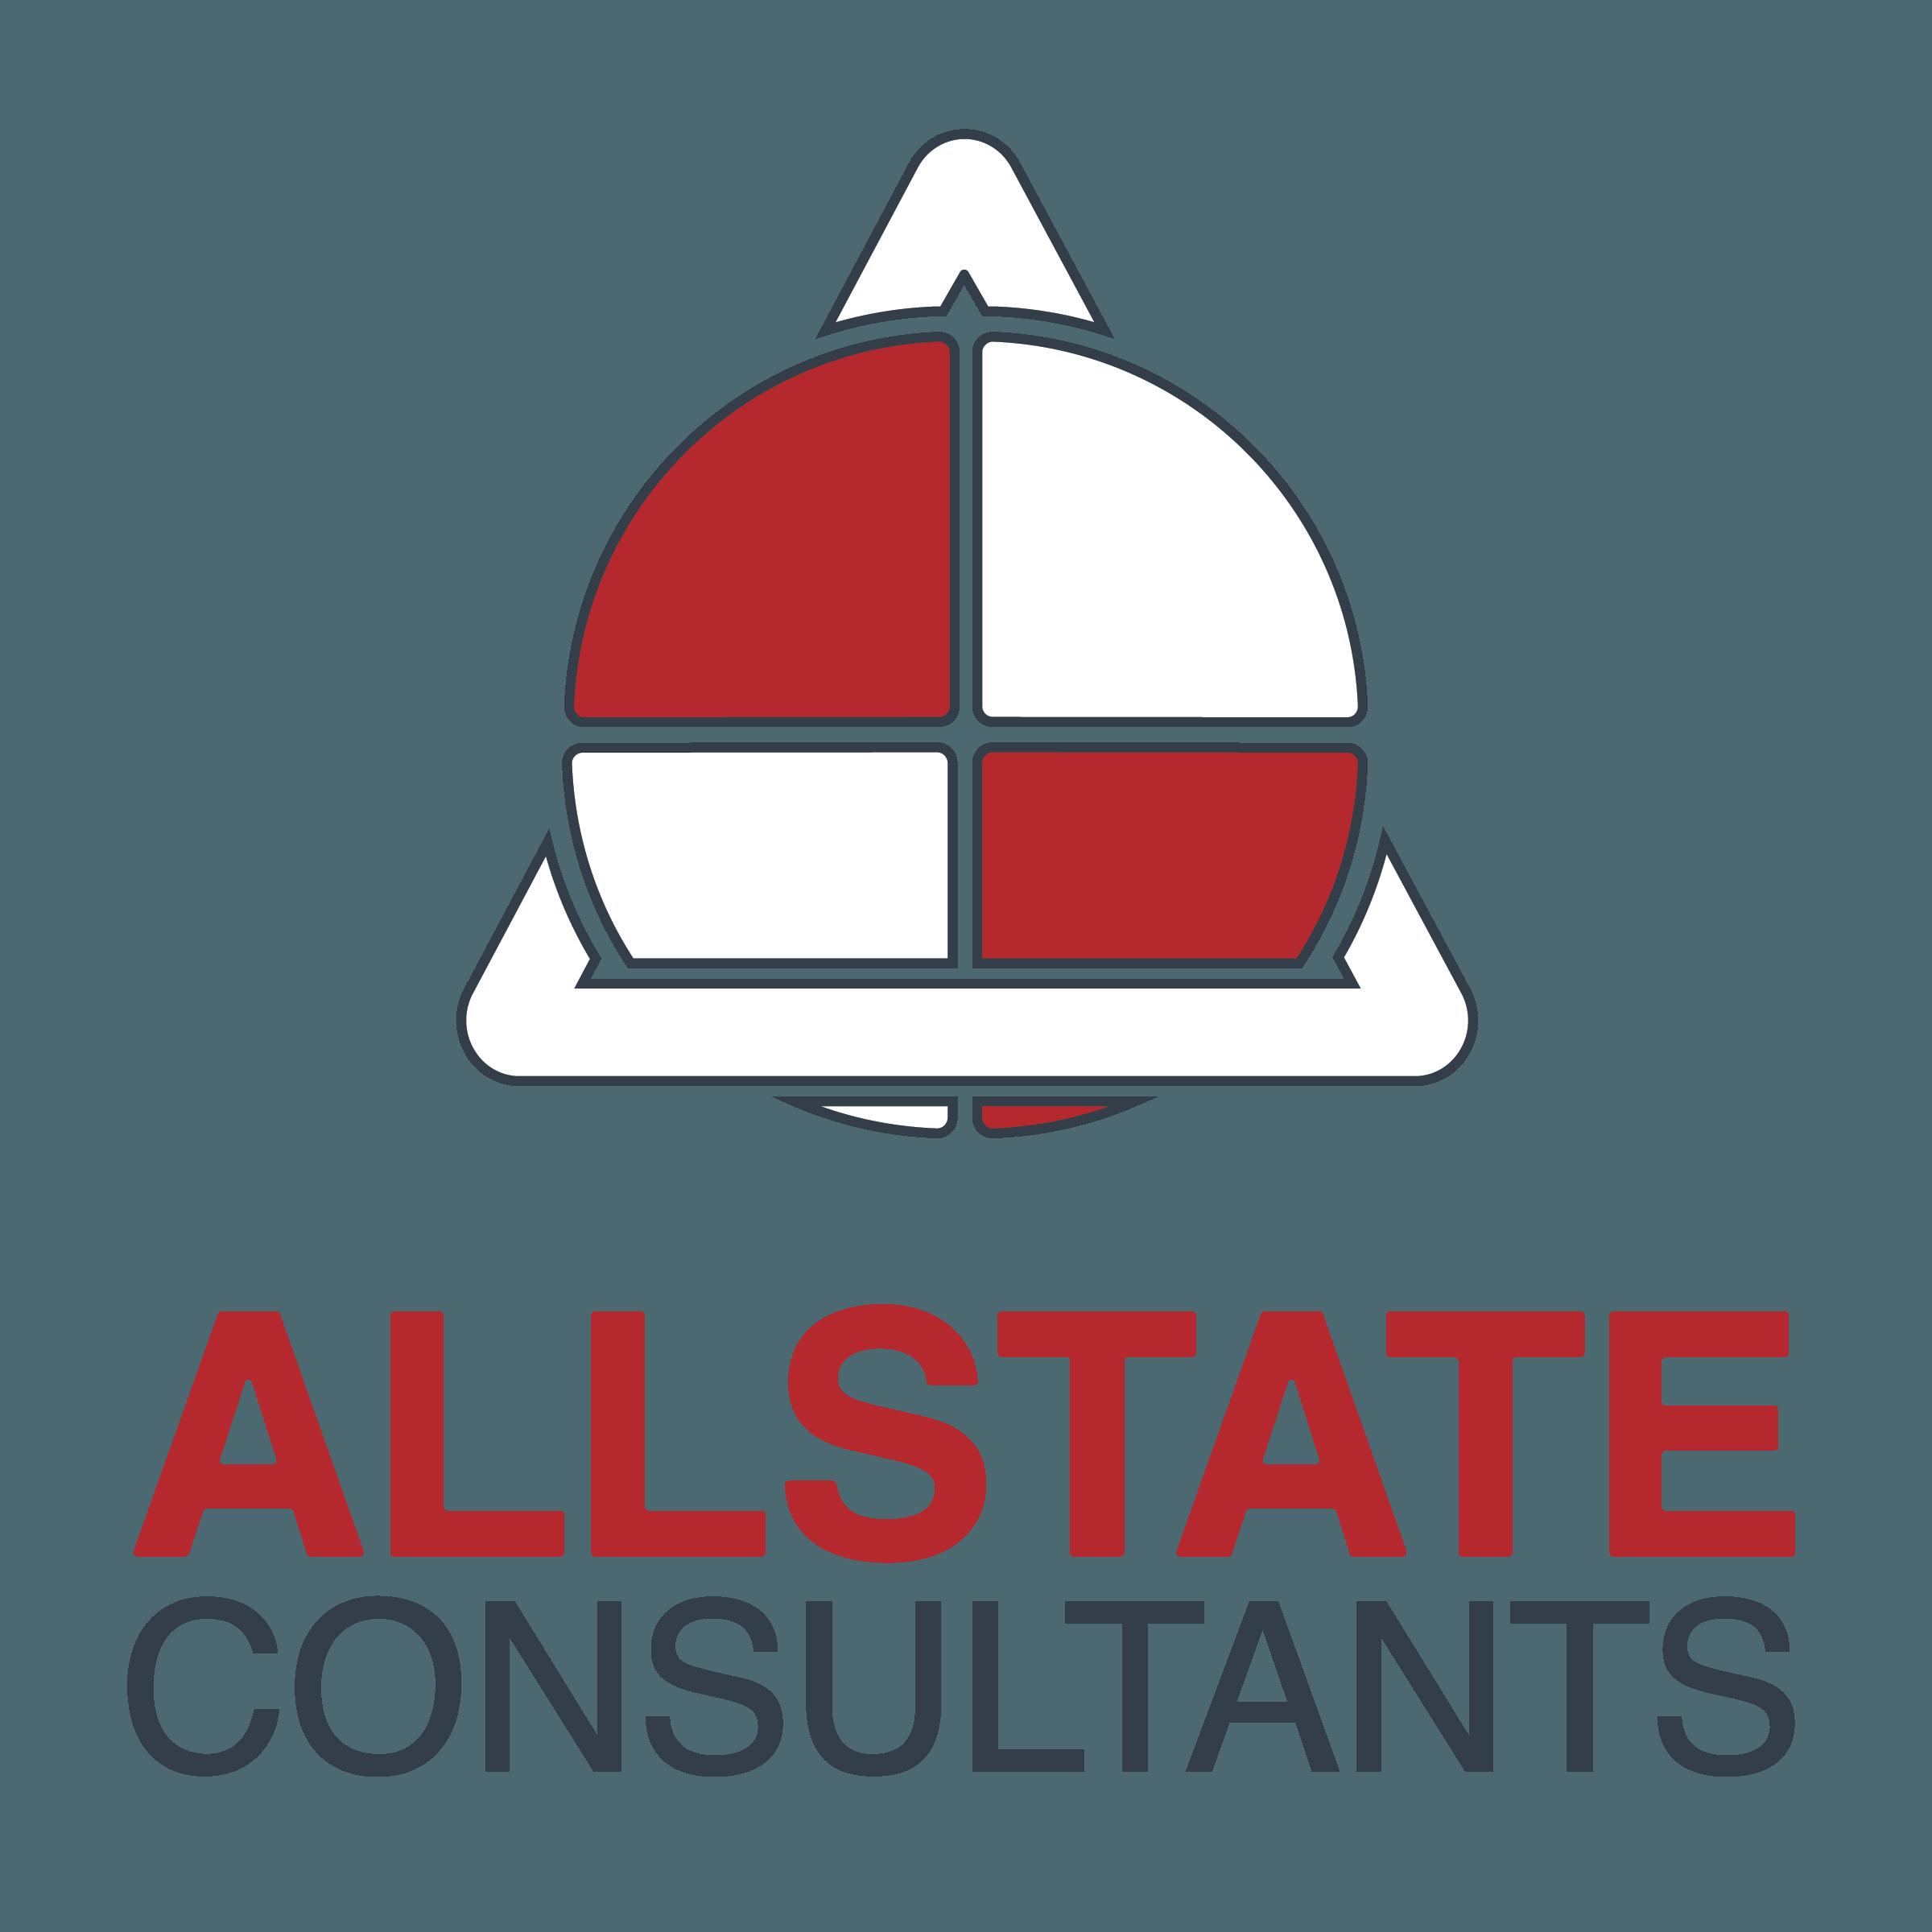 Allstate Consultants Logo